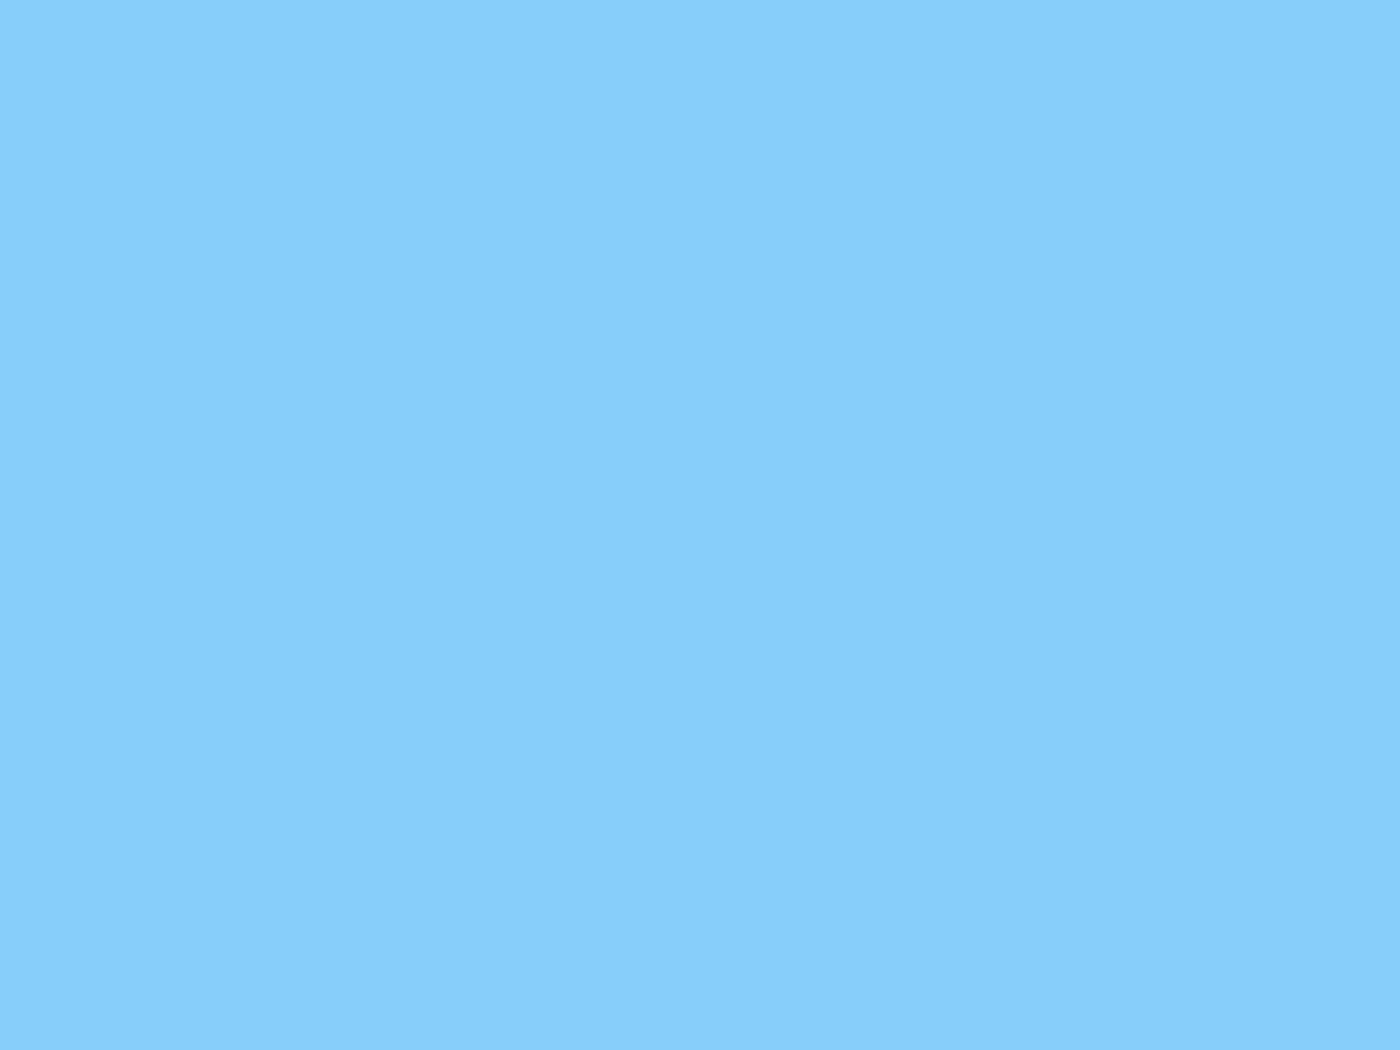 1400x1050 Light Sky Blue Solid Color Background